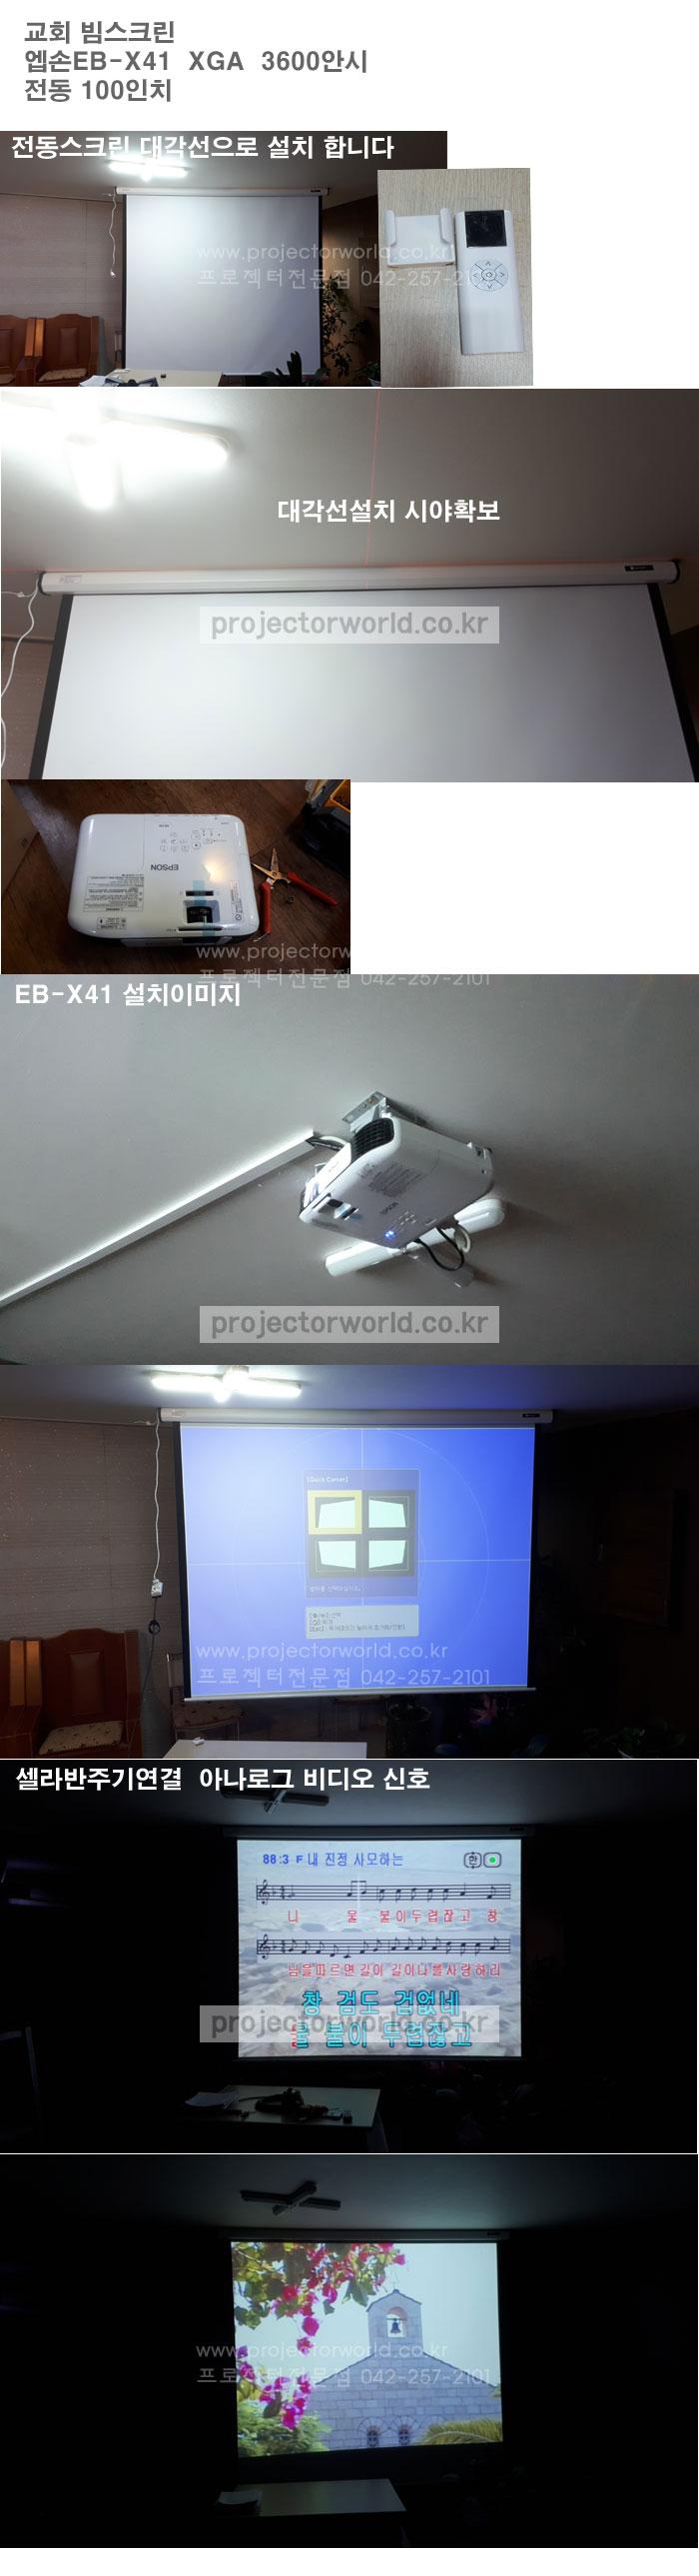 EB-X41,대전엡손빔설치,대전세종프로젝터,교회프로젝터대전점,